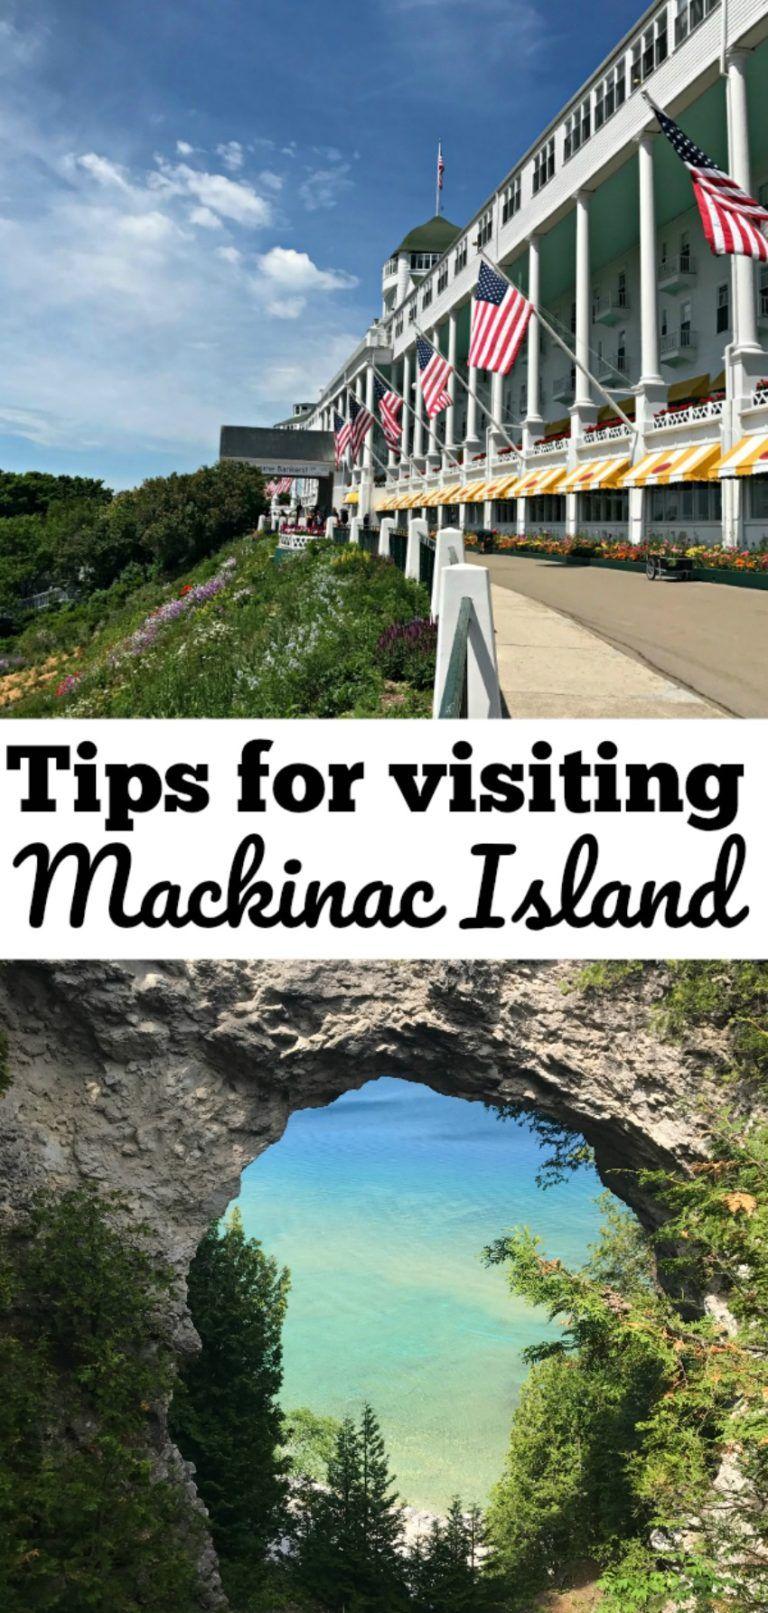 A Sleeping Bear Dunes Travel Guide For Families Mackinac Island Best Island Vacation Australia Travel